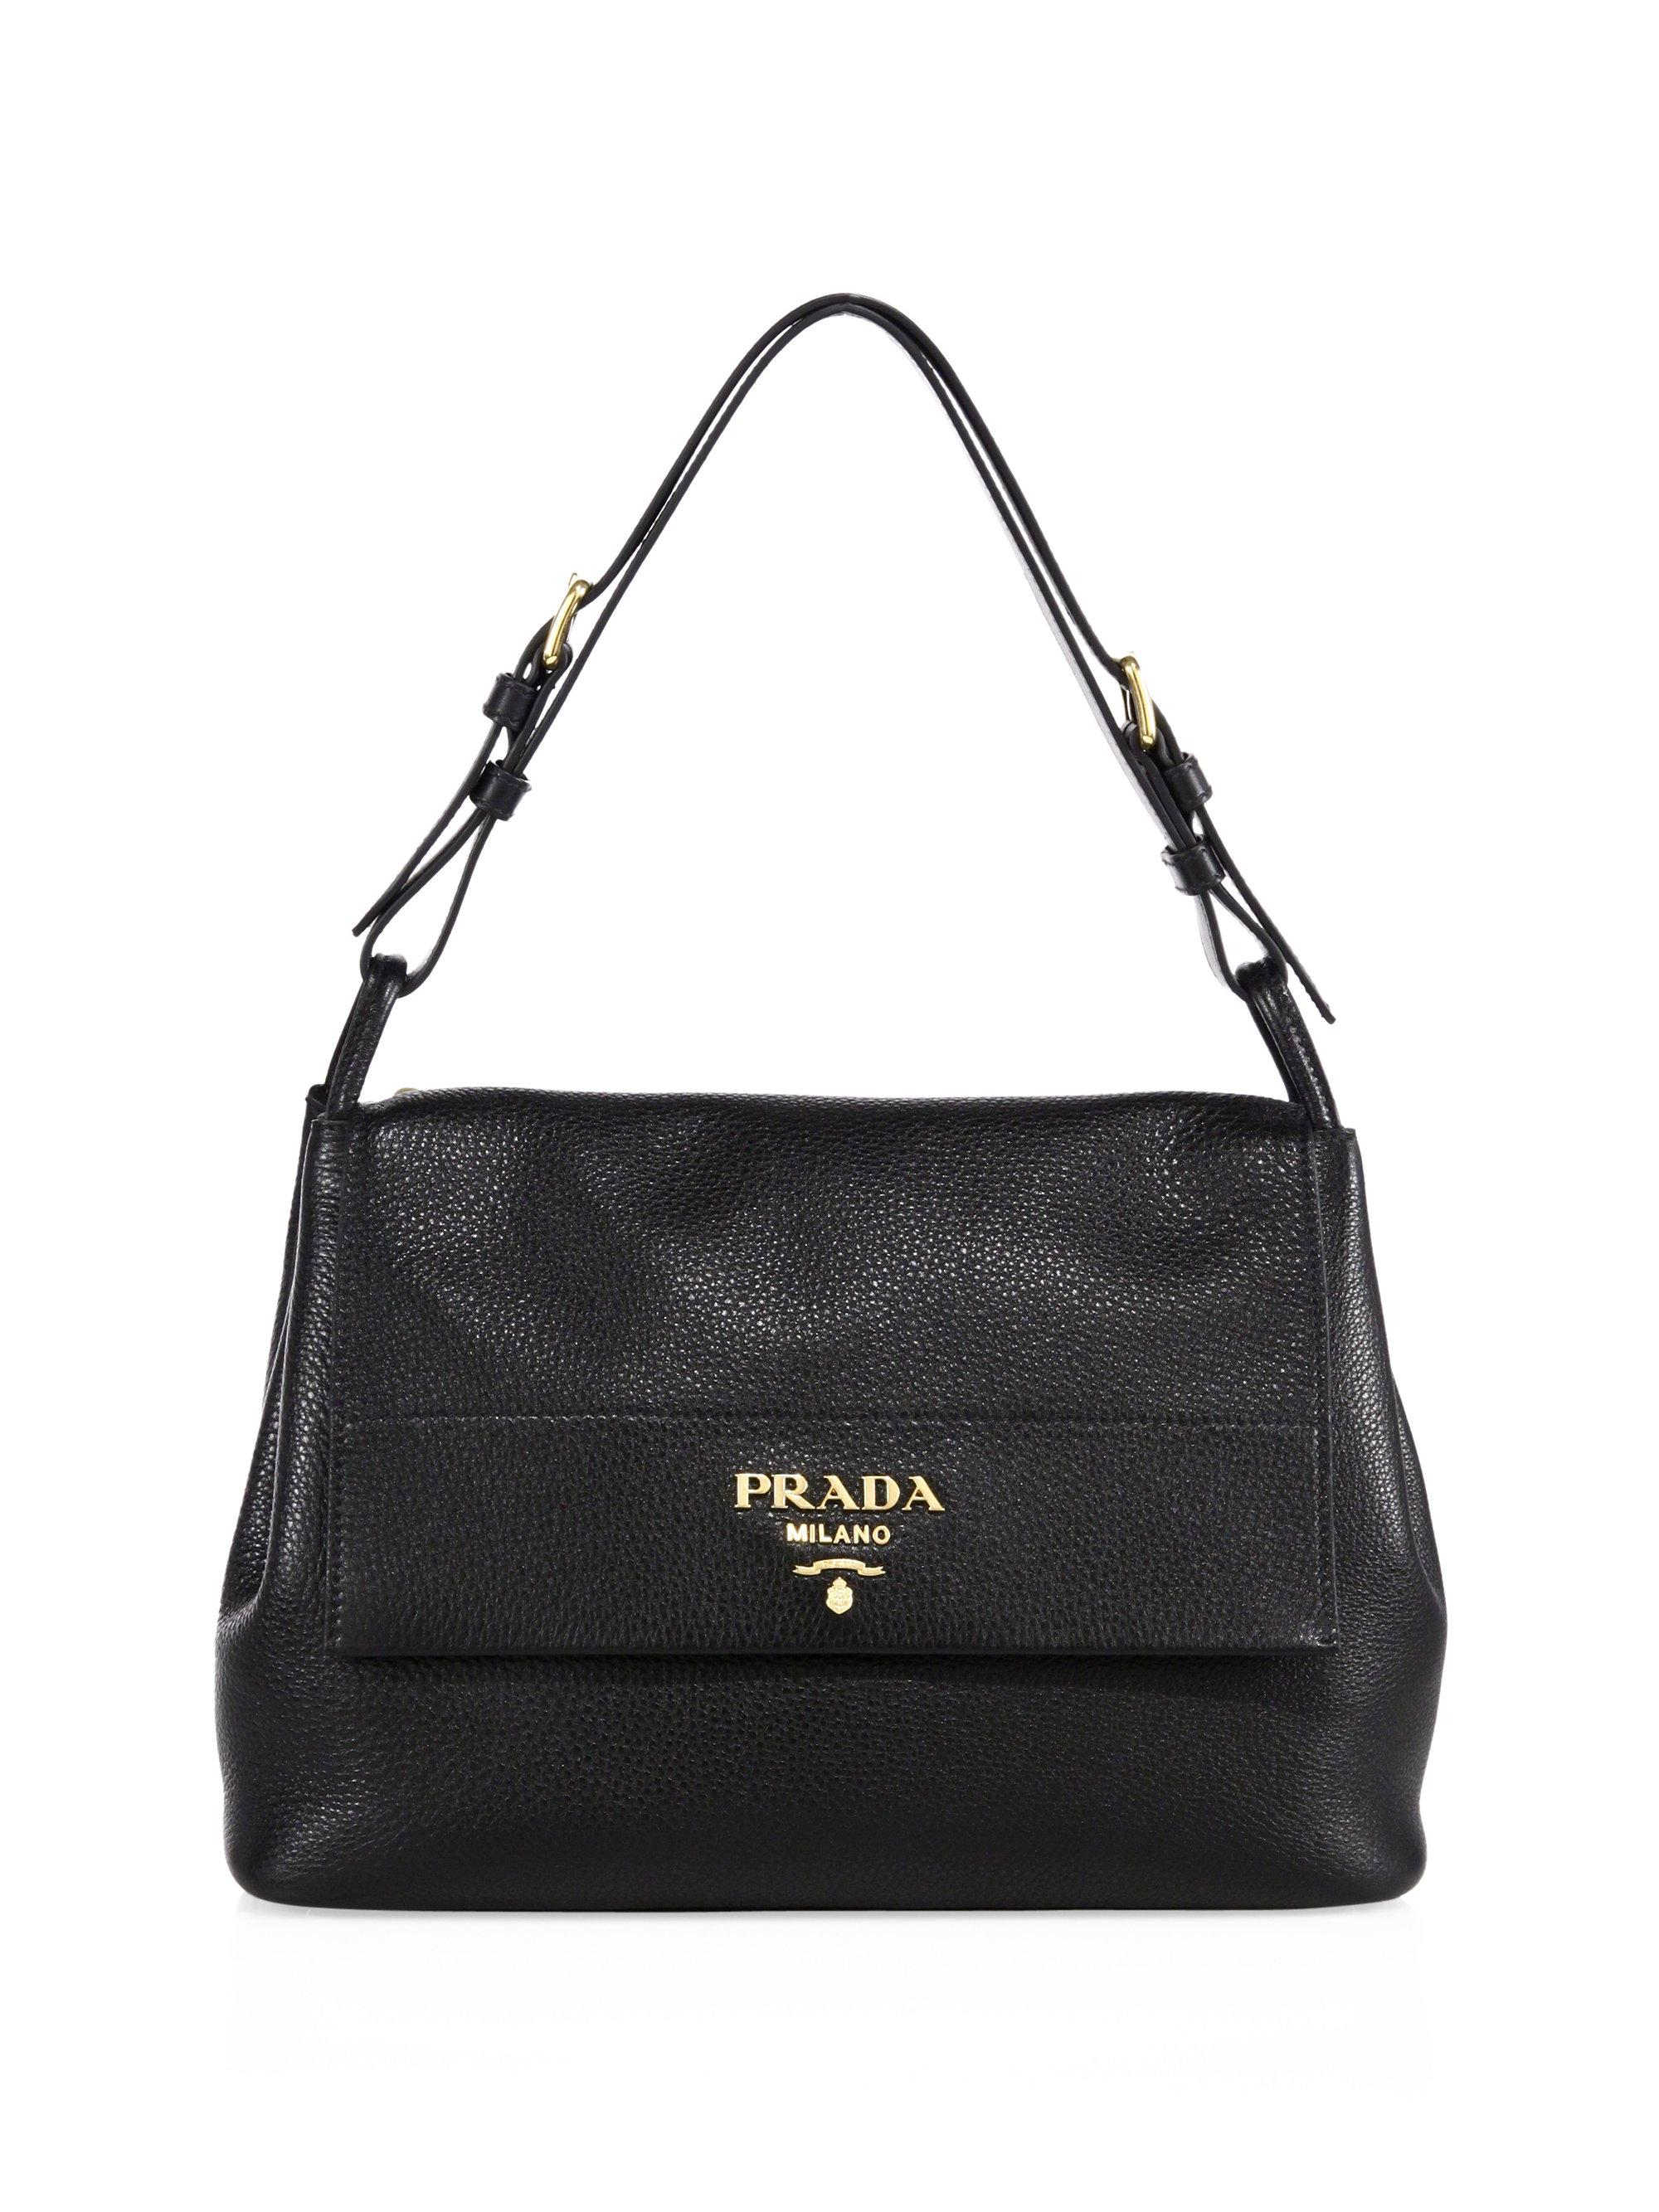 313b599e7a33 Lyst - Prada Daino Leather Flap Shoulder Bag in Black